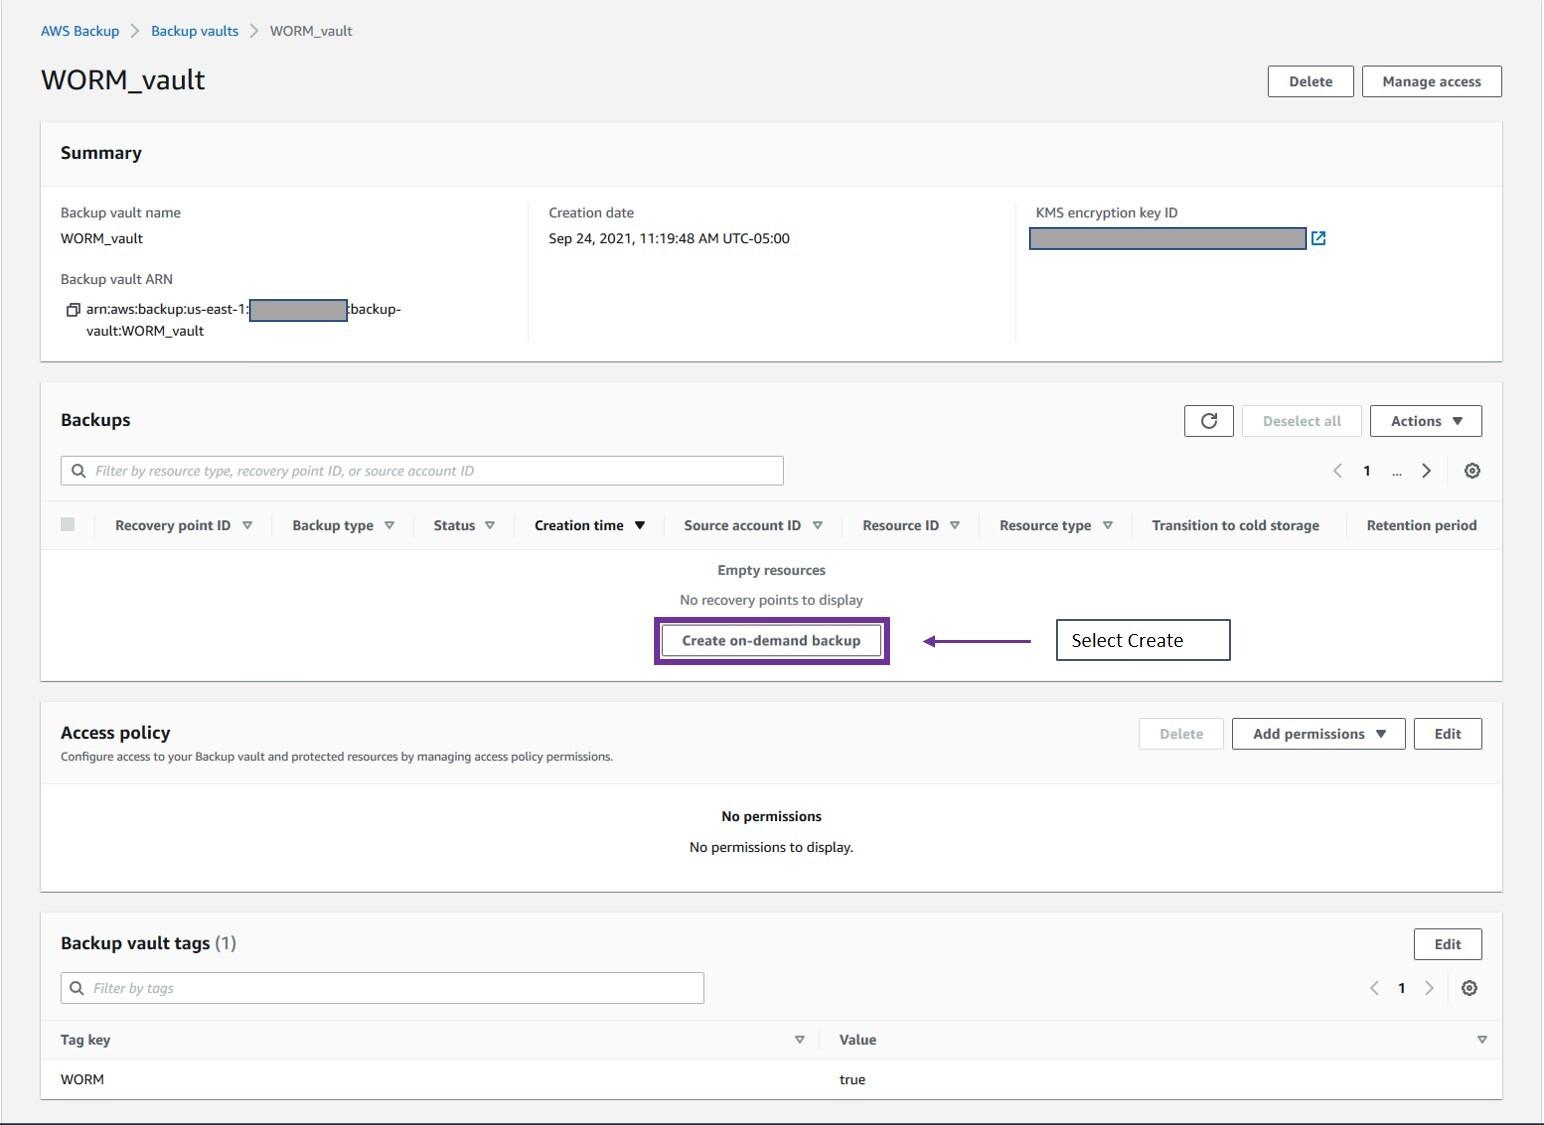 Select Create on-demand backup